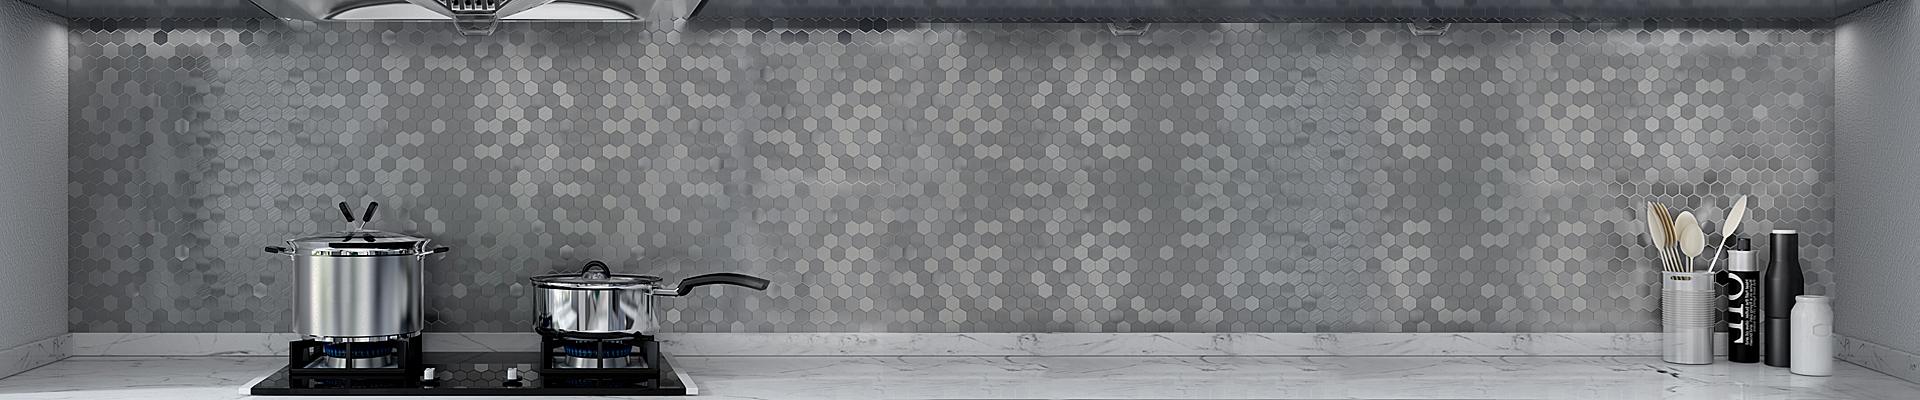 video-metal tiles hsw18181 for villa Heng Xing-Heng Xing-img